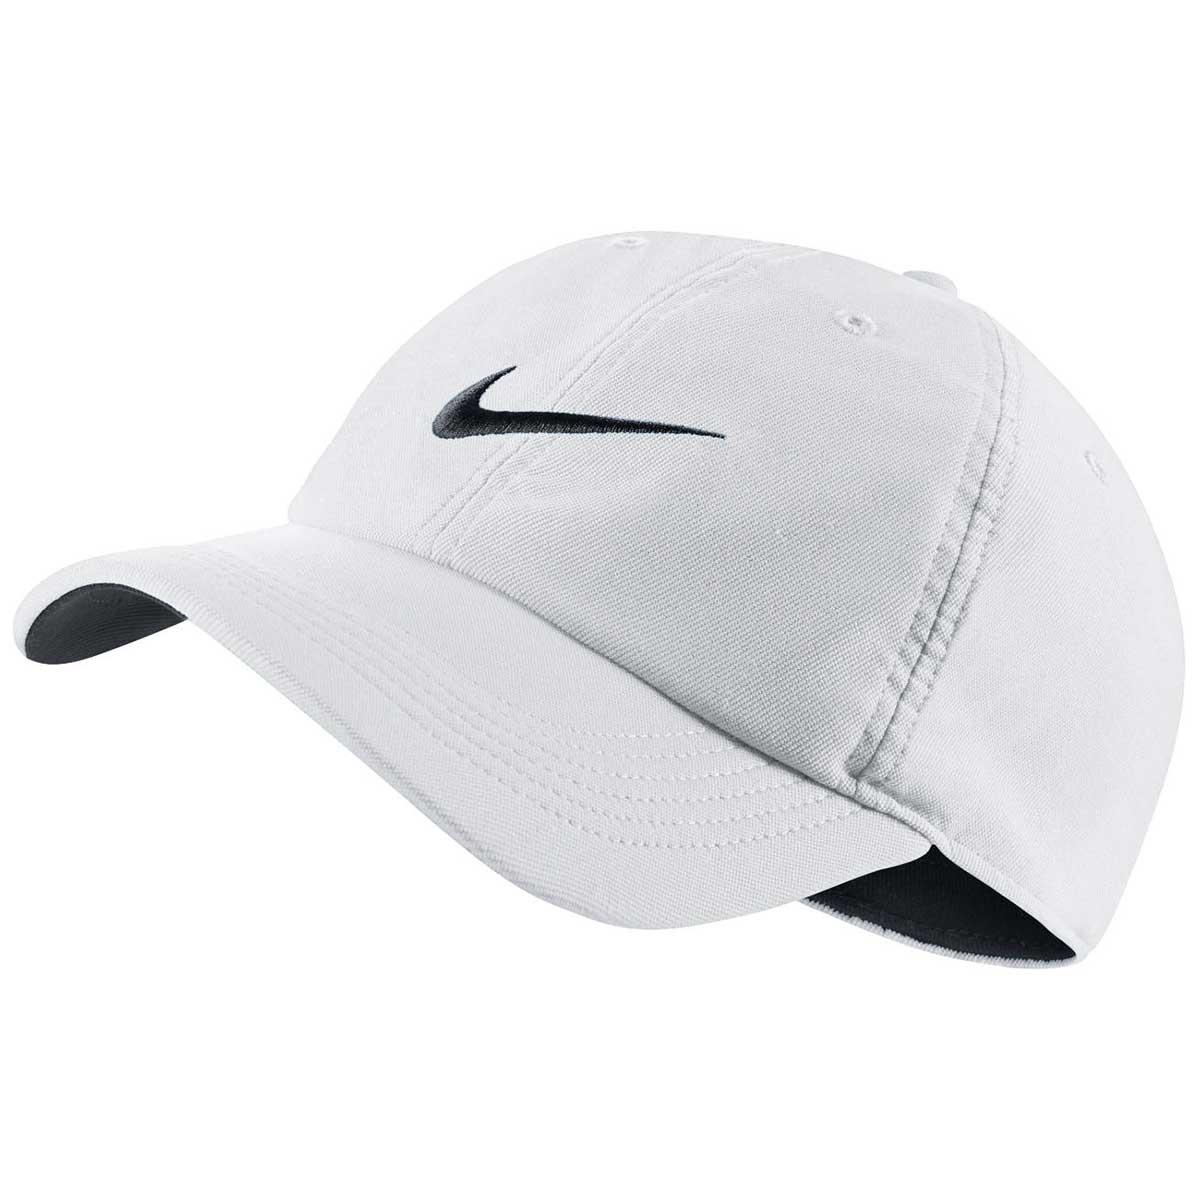 Buy Nike Heritage Dri-Fit Train Twill Adjustable Cap Online India ... 697dc3949d4